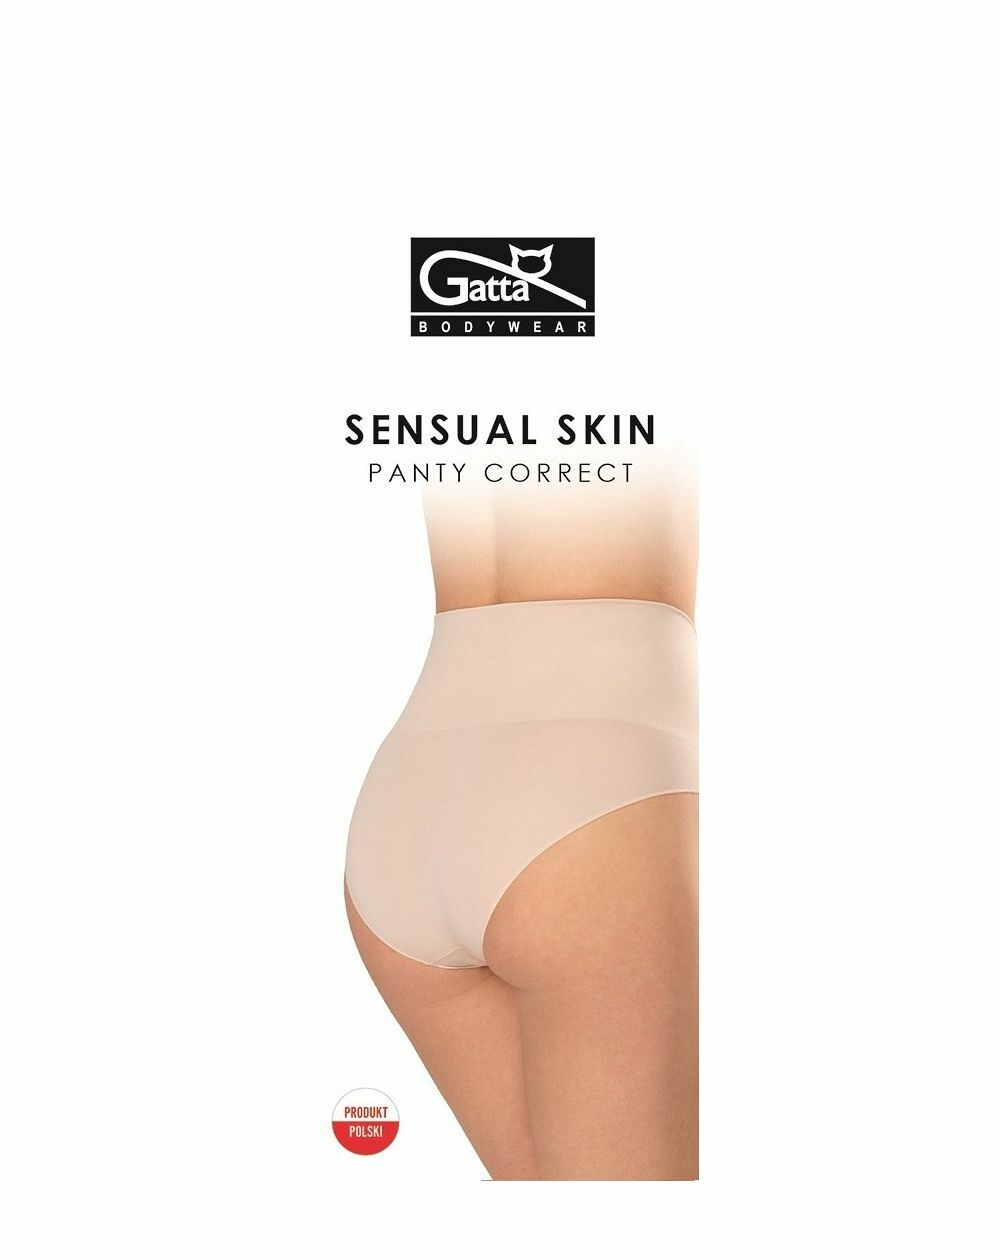 Figi Gatta 41662 Panty Correct Sensual